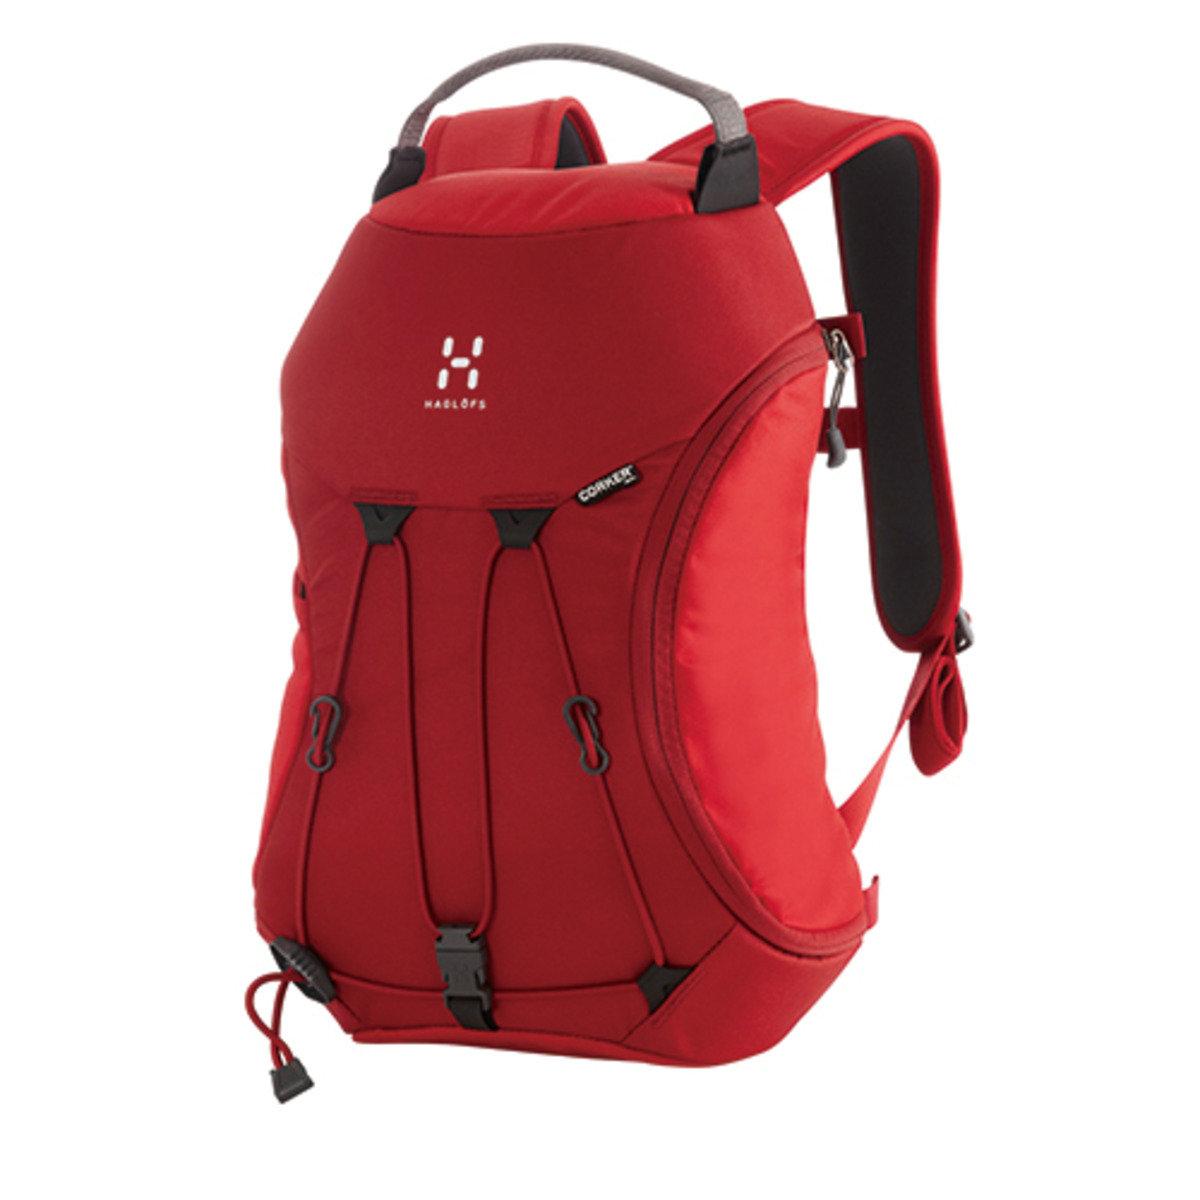 Corker Small-Rubin/R.Red-339200